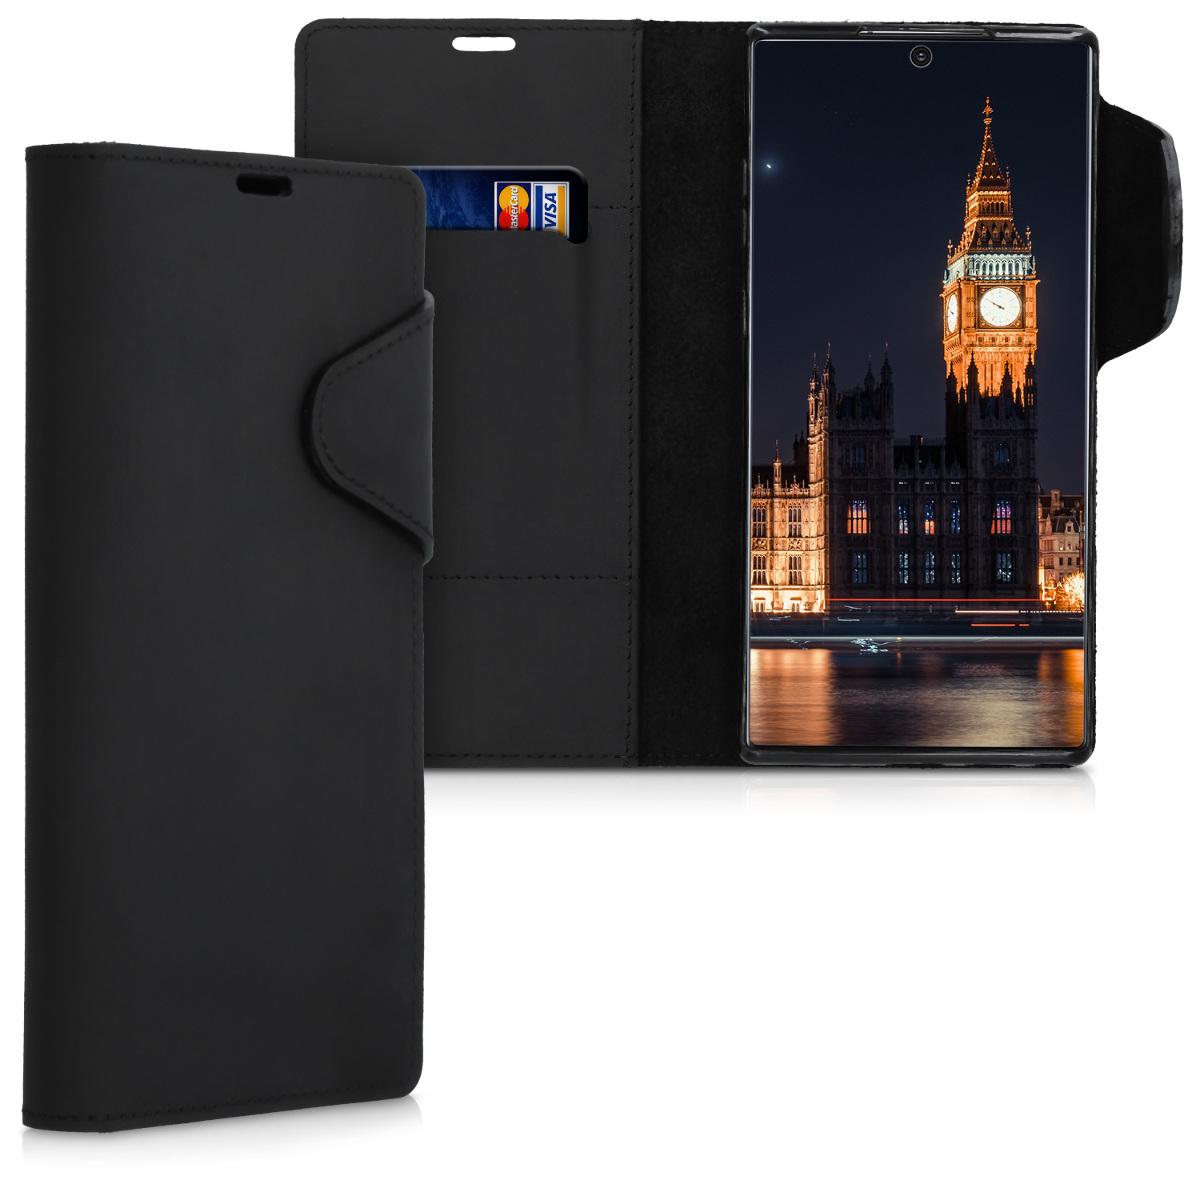 Kalibri Δερμάτινη Suede Θήκη - Πορτοφόλι Samsung Galaxy Note 10 Plus - Black (49355.01)